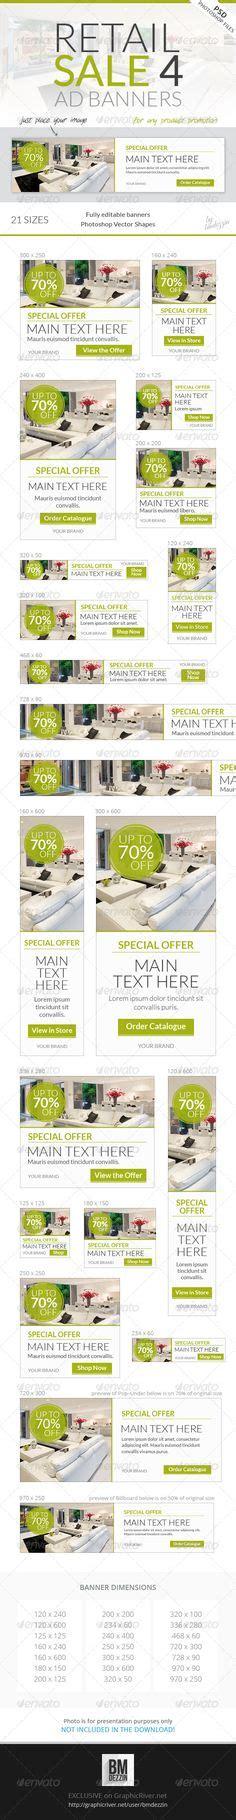 retail pc printable laser price tags 5 1 2 x7 sale